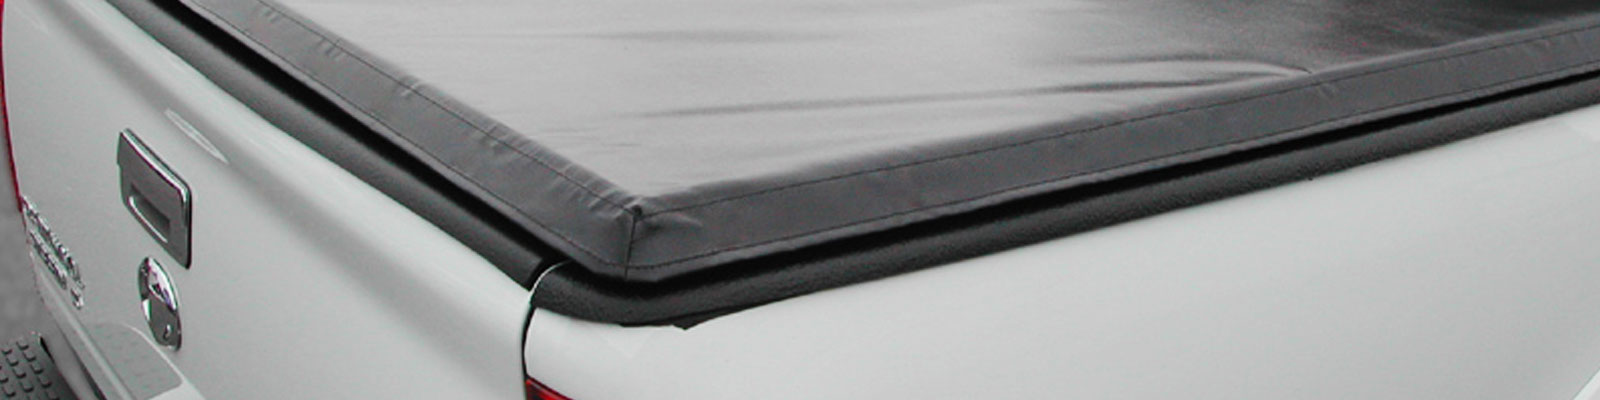 Custom Soft Load Bed Covers